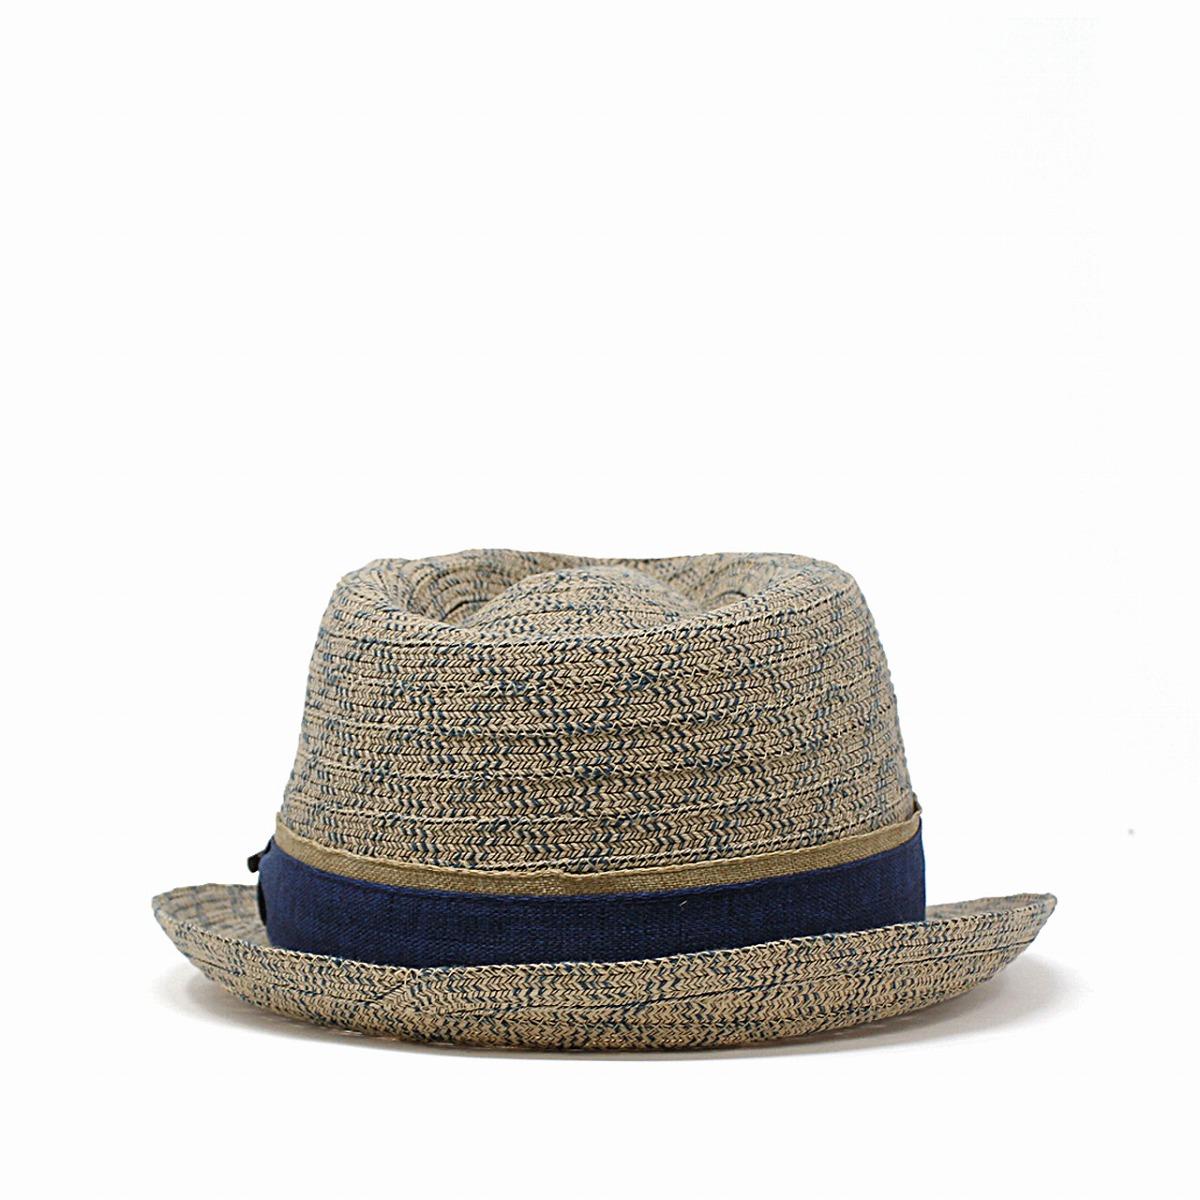 1021caeb ELEHELM HAT STORE: The summer material M L XL dark blue navy [fedora ...